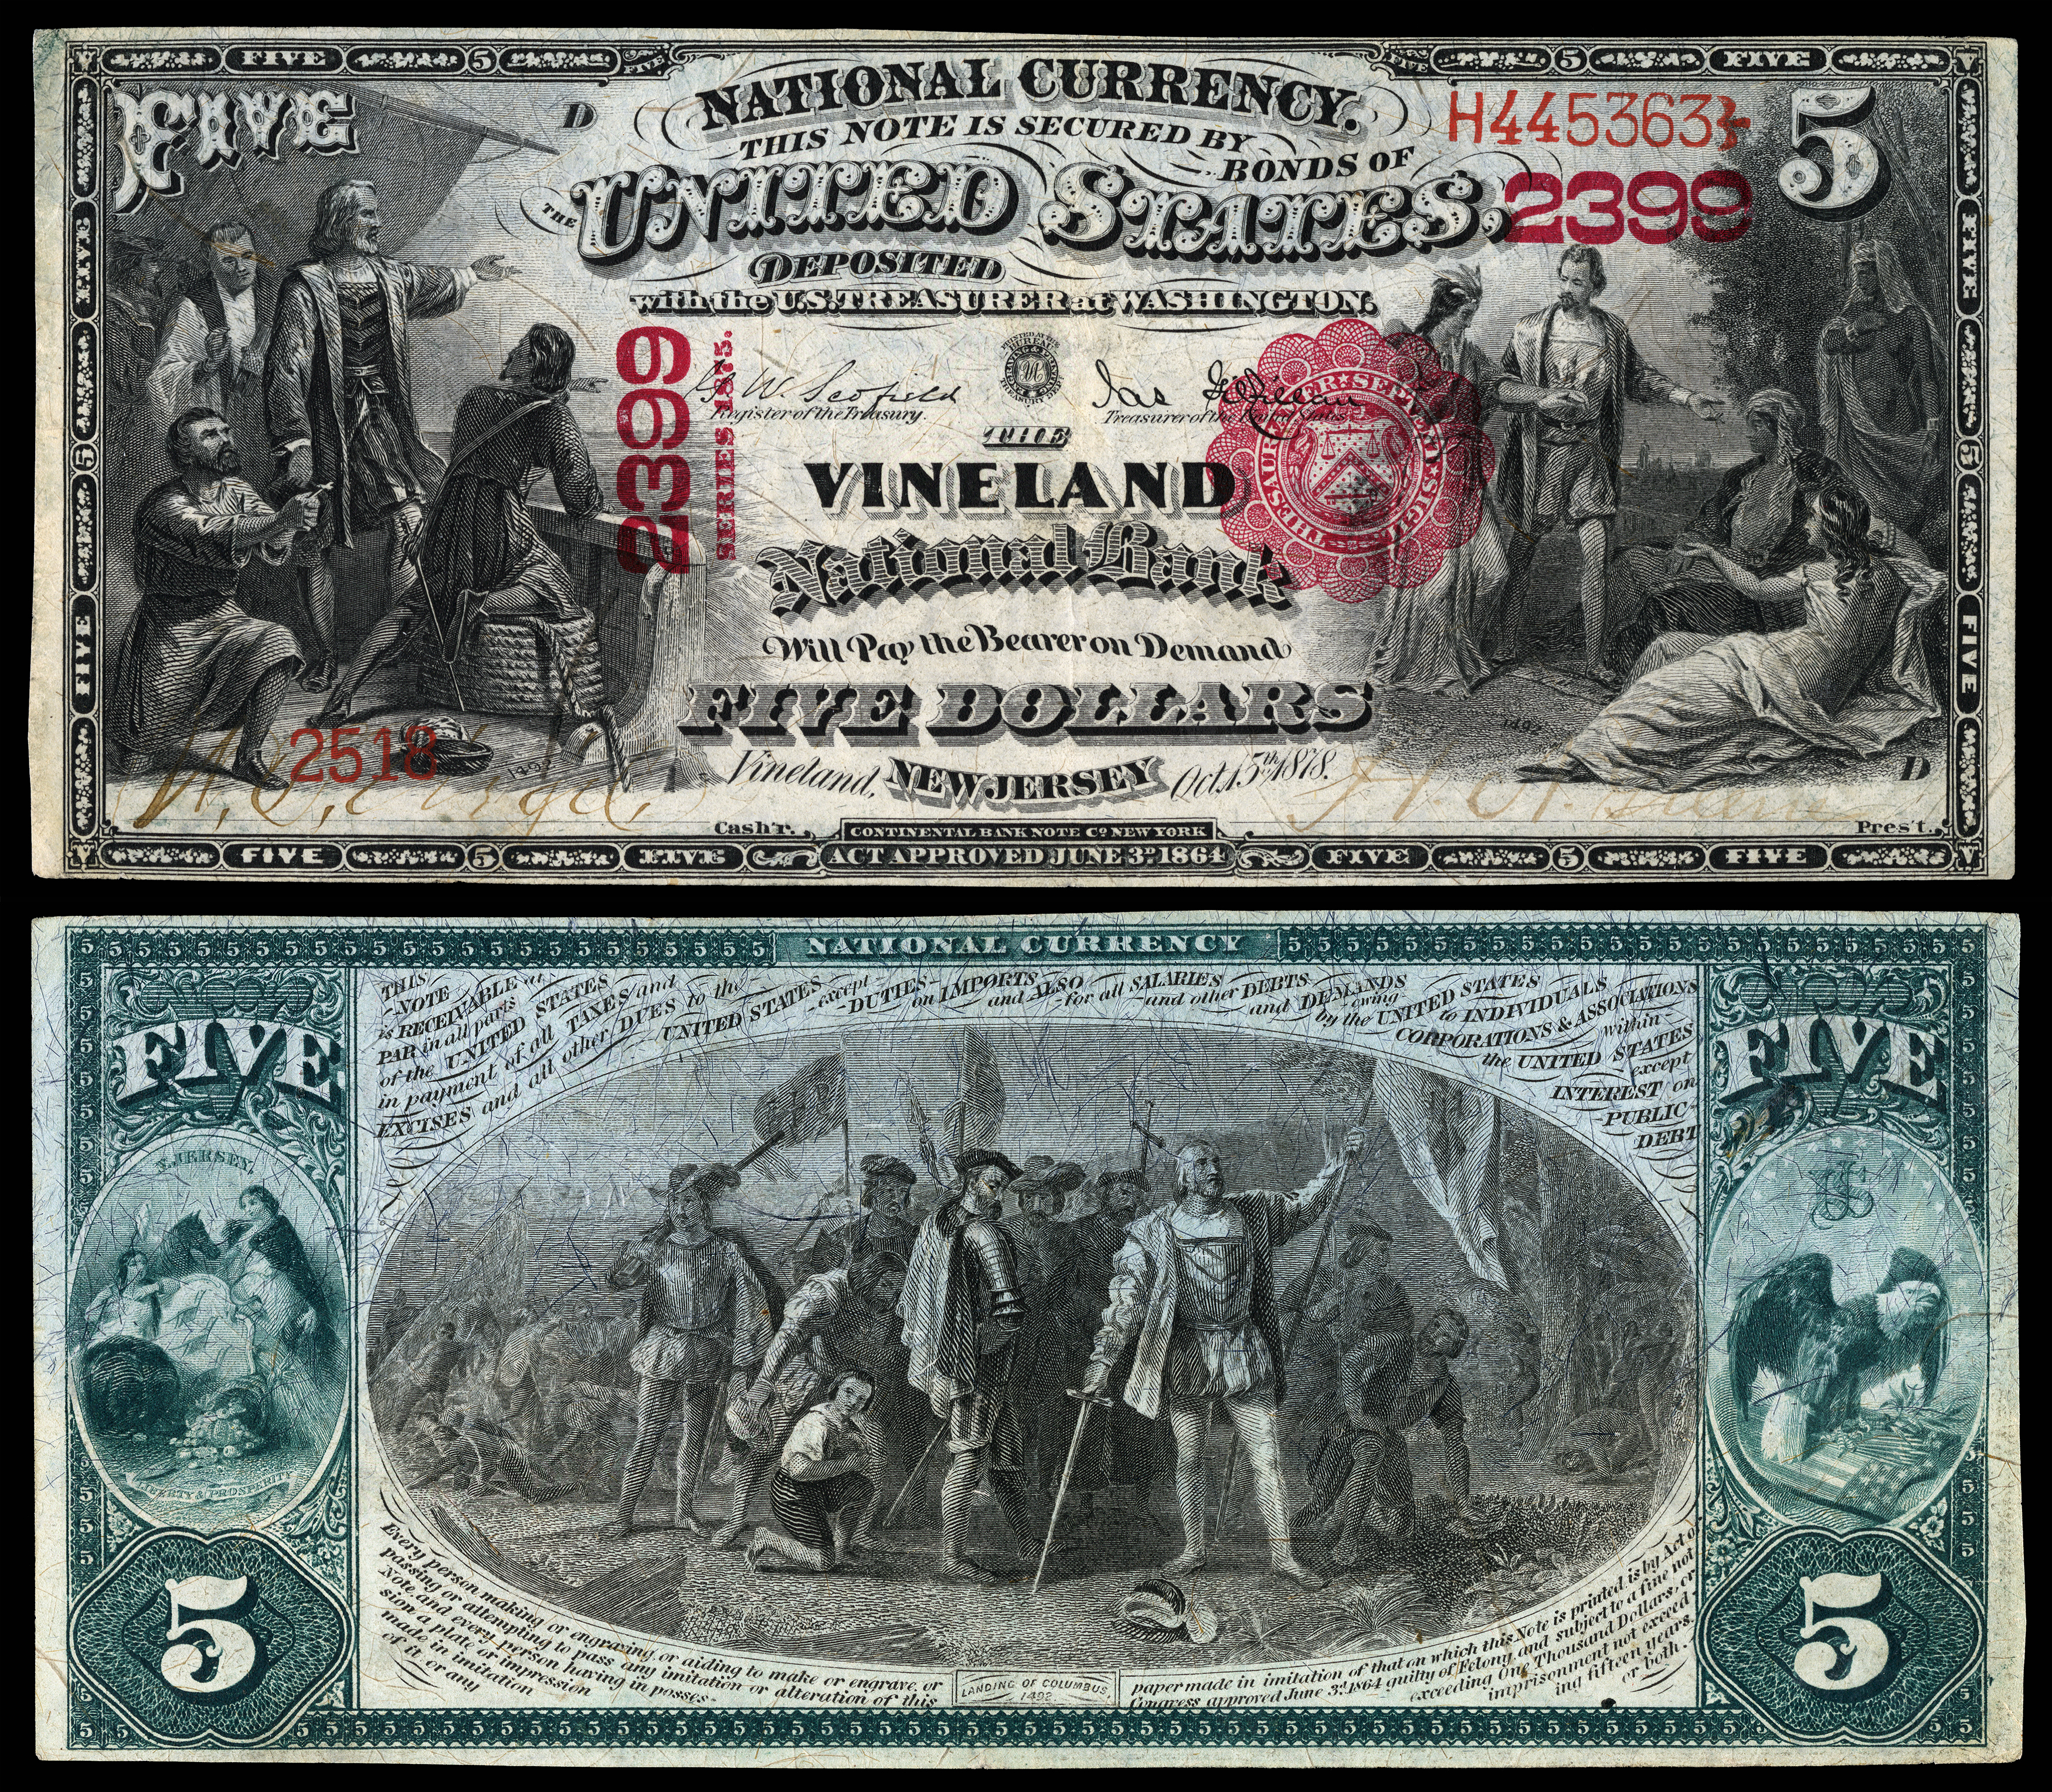 File:US-NBN-NJ-Vineland-2399-1875-5-